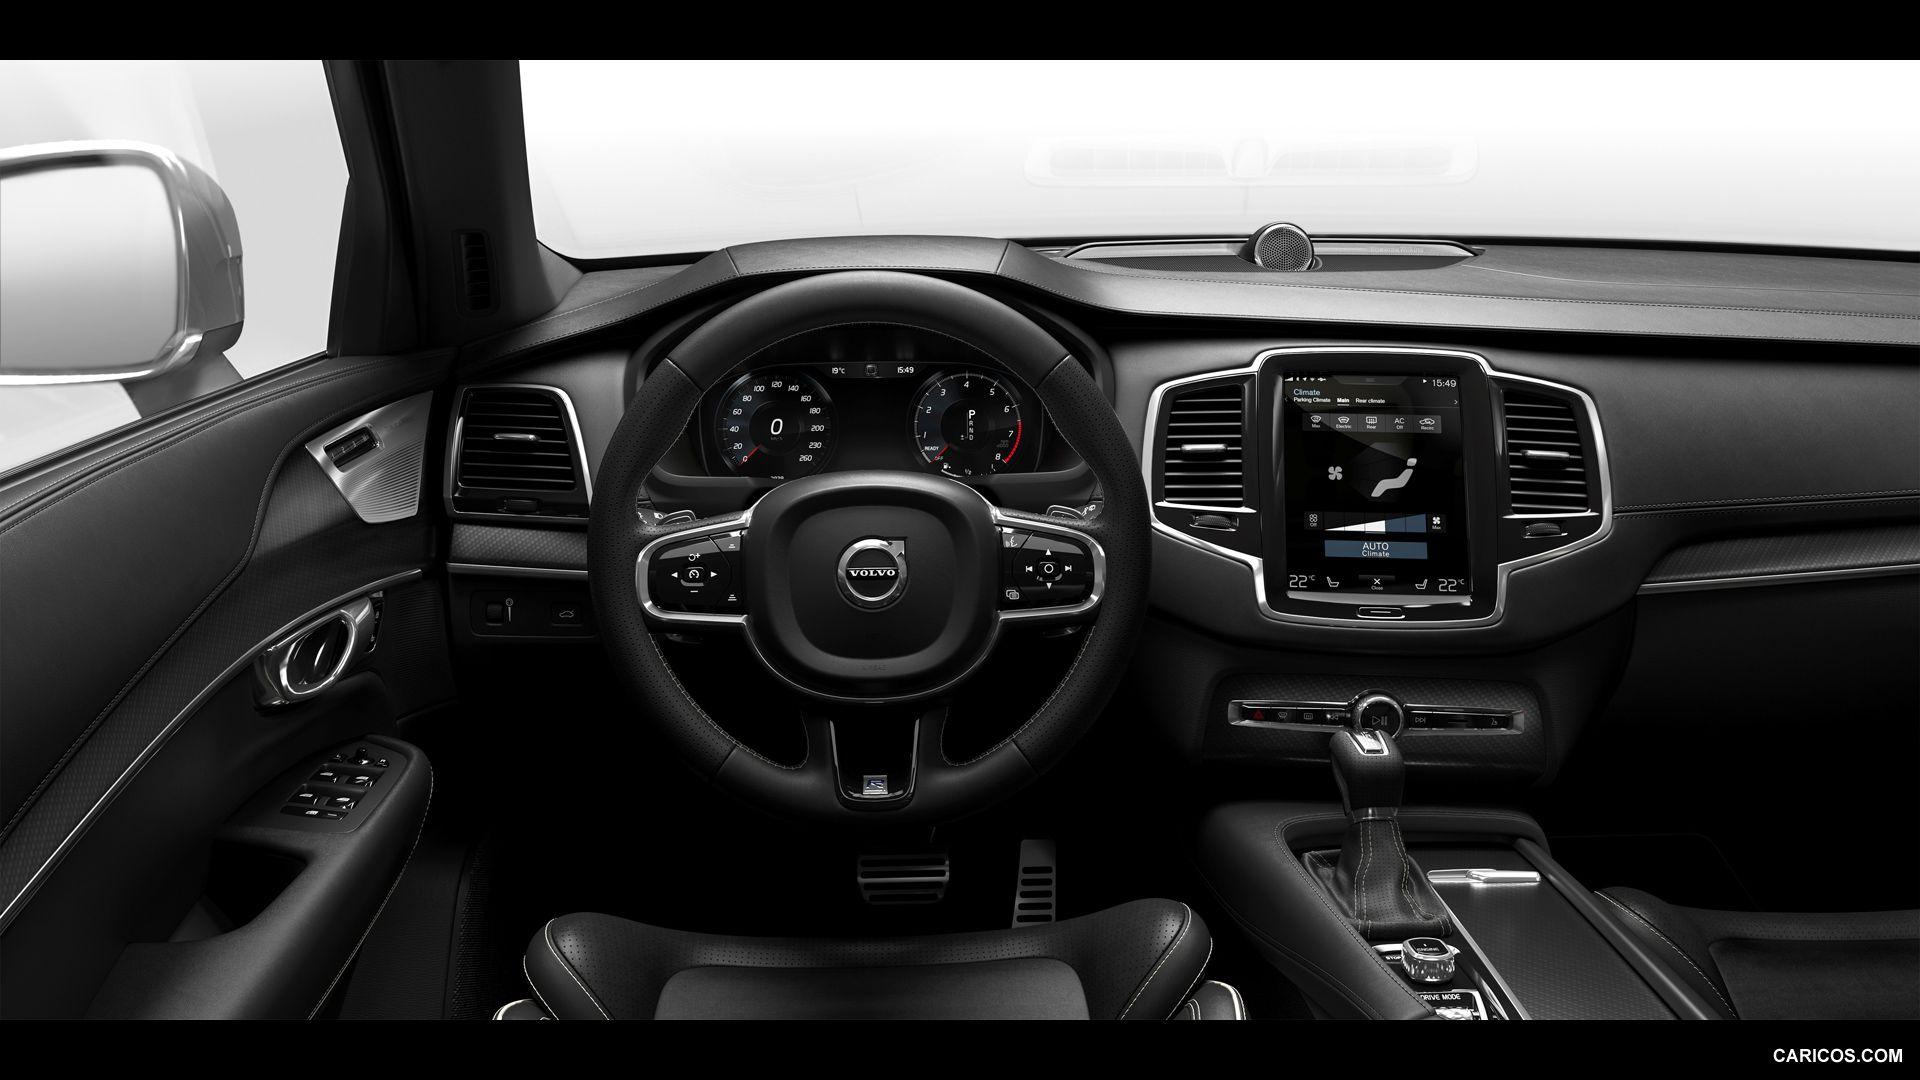 2015 Volvo Xc90 R Design Wallpaper Volvo Xc90 Volvo